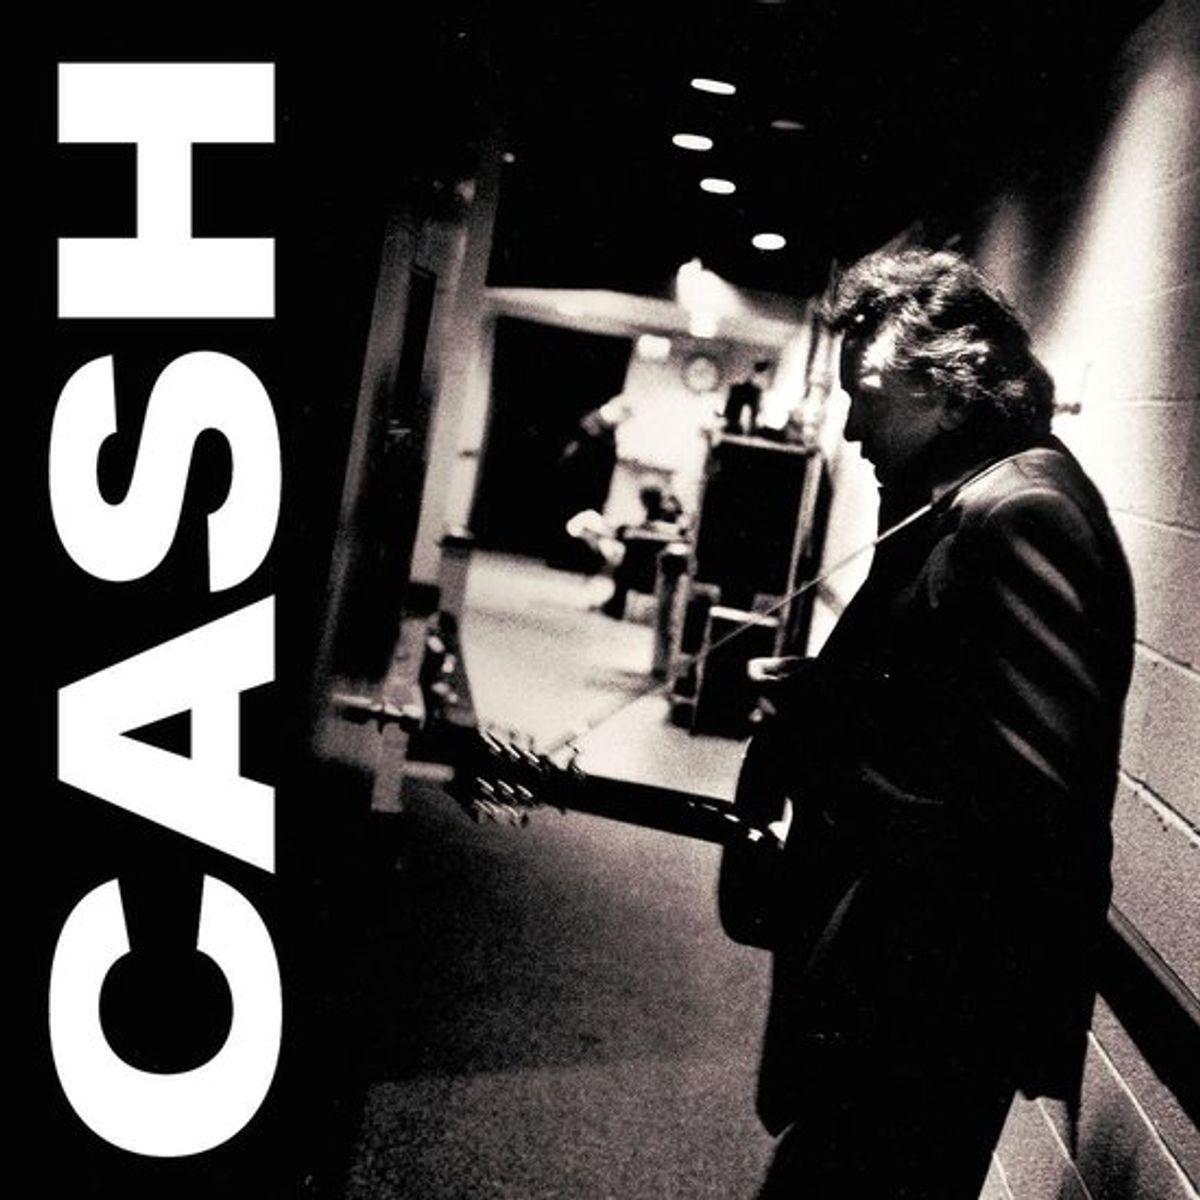 #Claustrofobisch - Johnny Cash - I See A Darkness (2000)